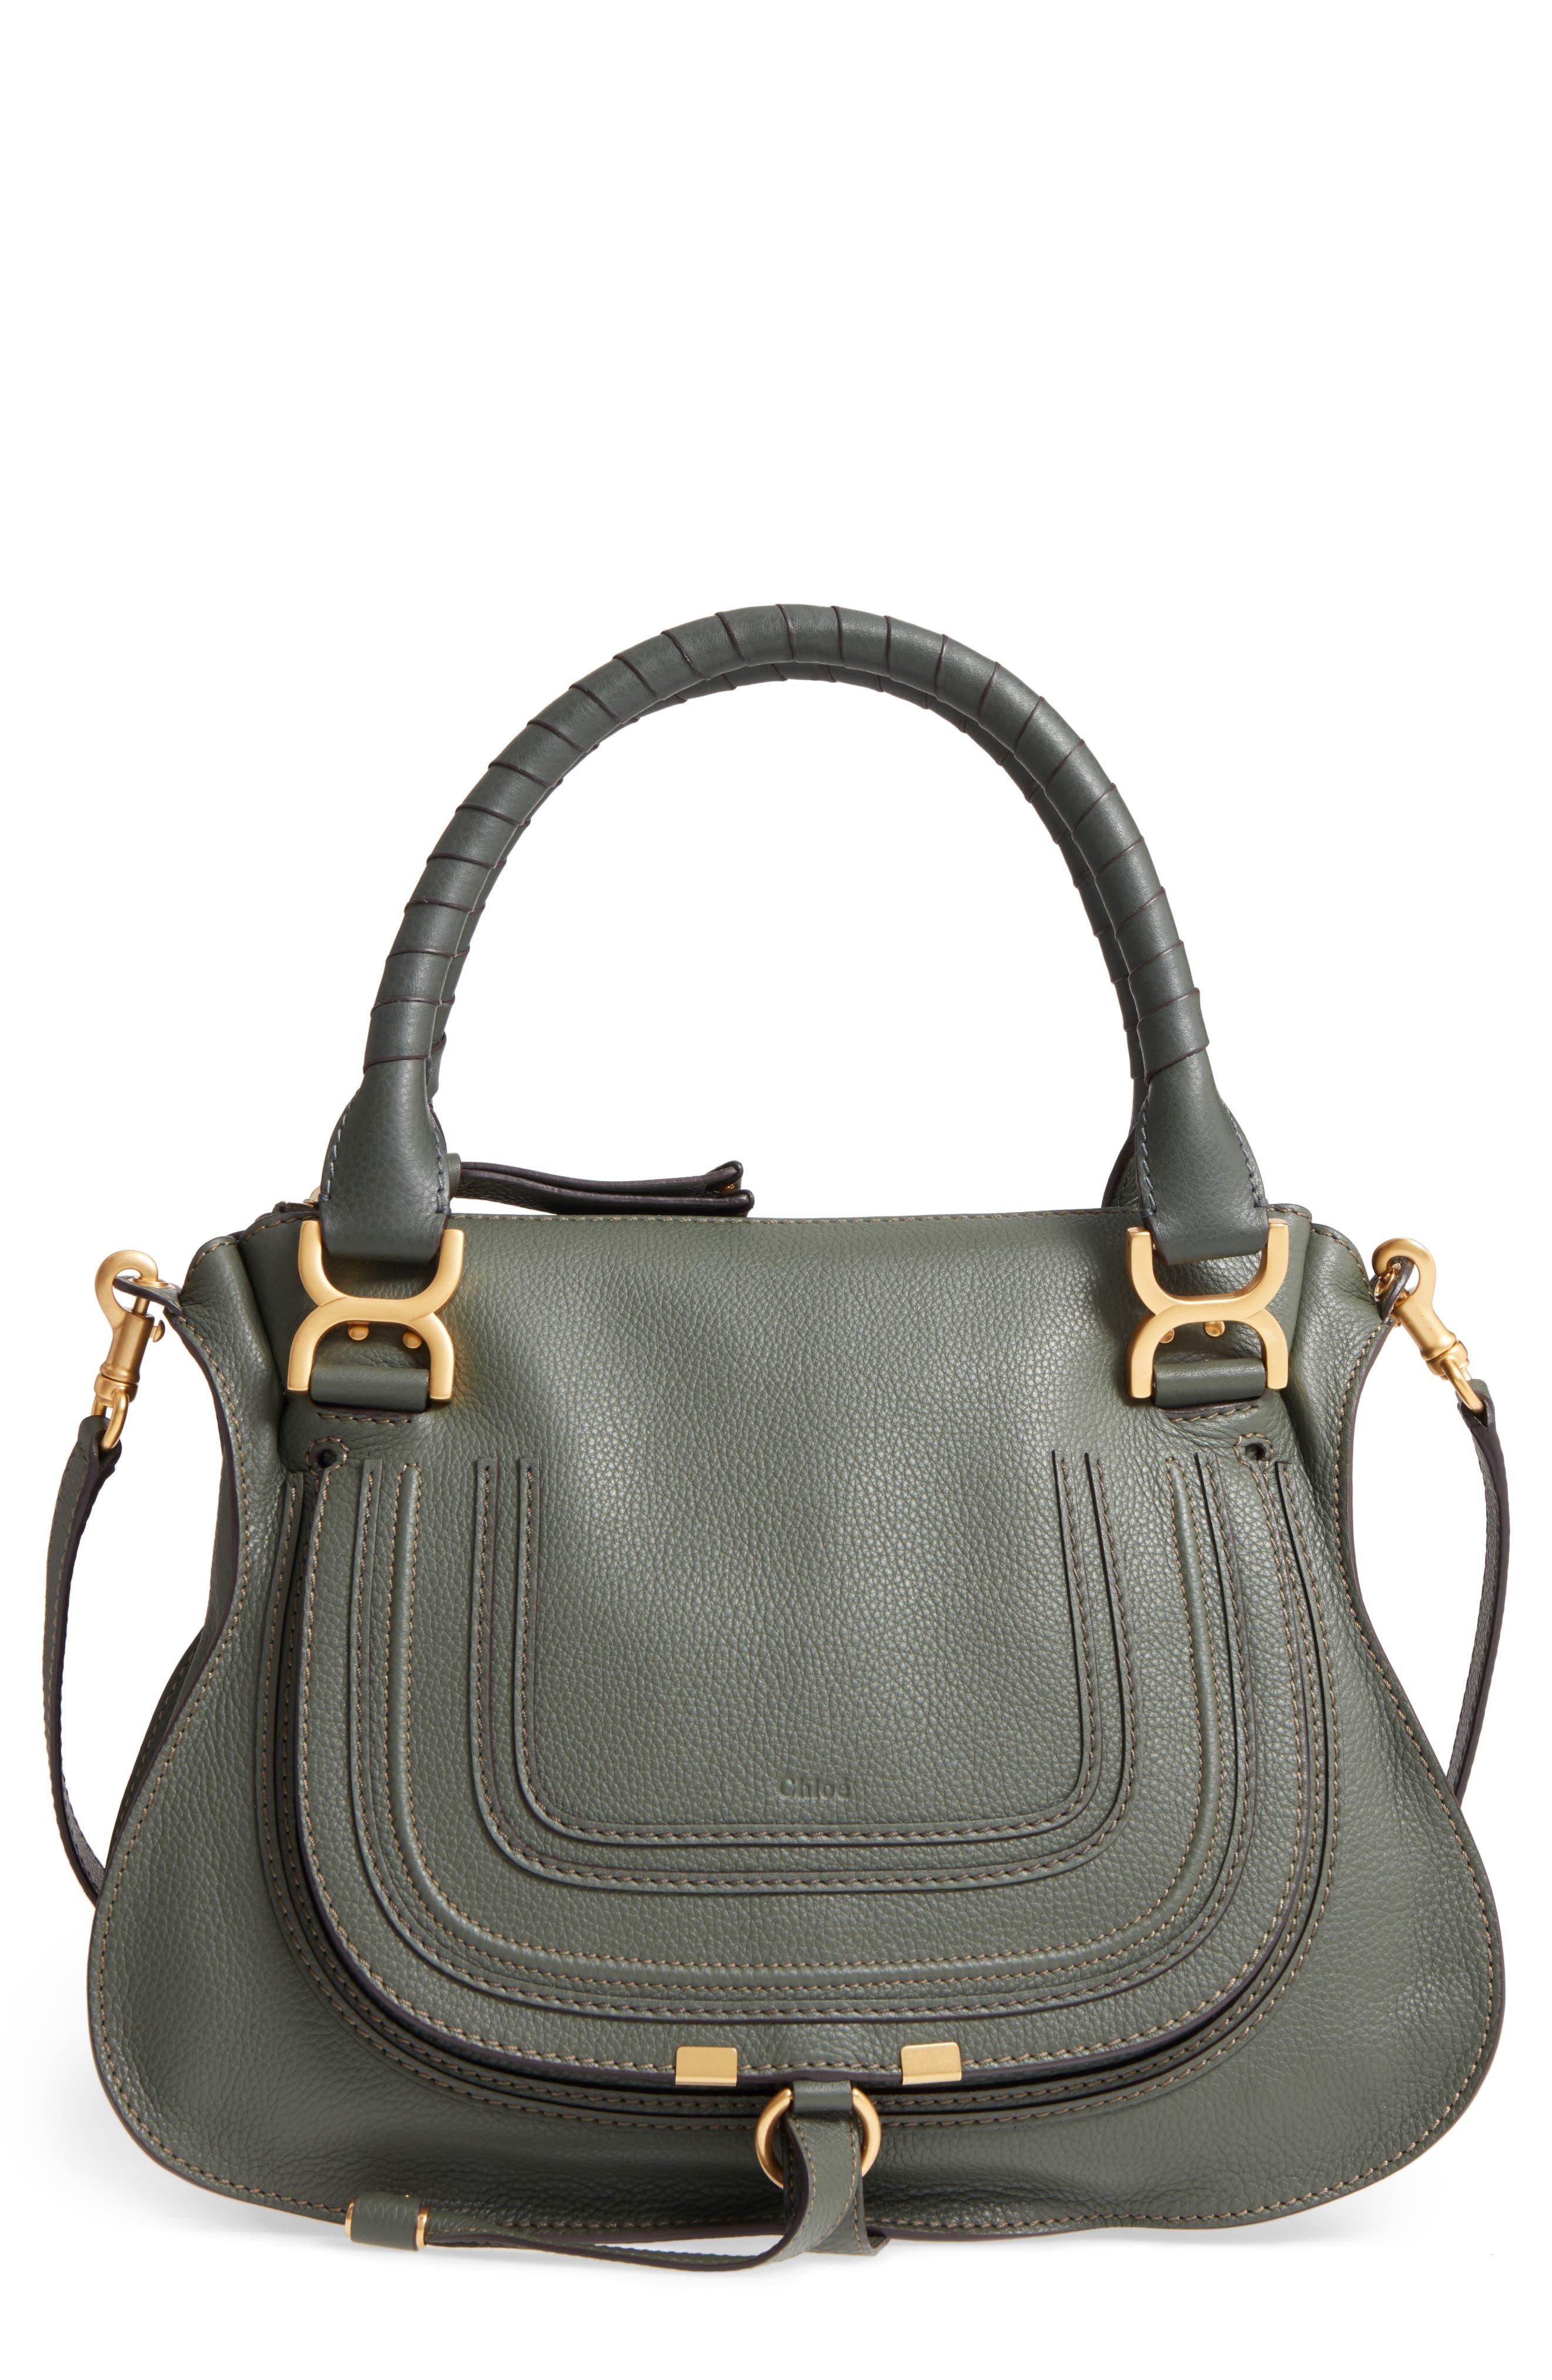 Main Image - Chloé 'Medium Marcie' Leather Satchel